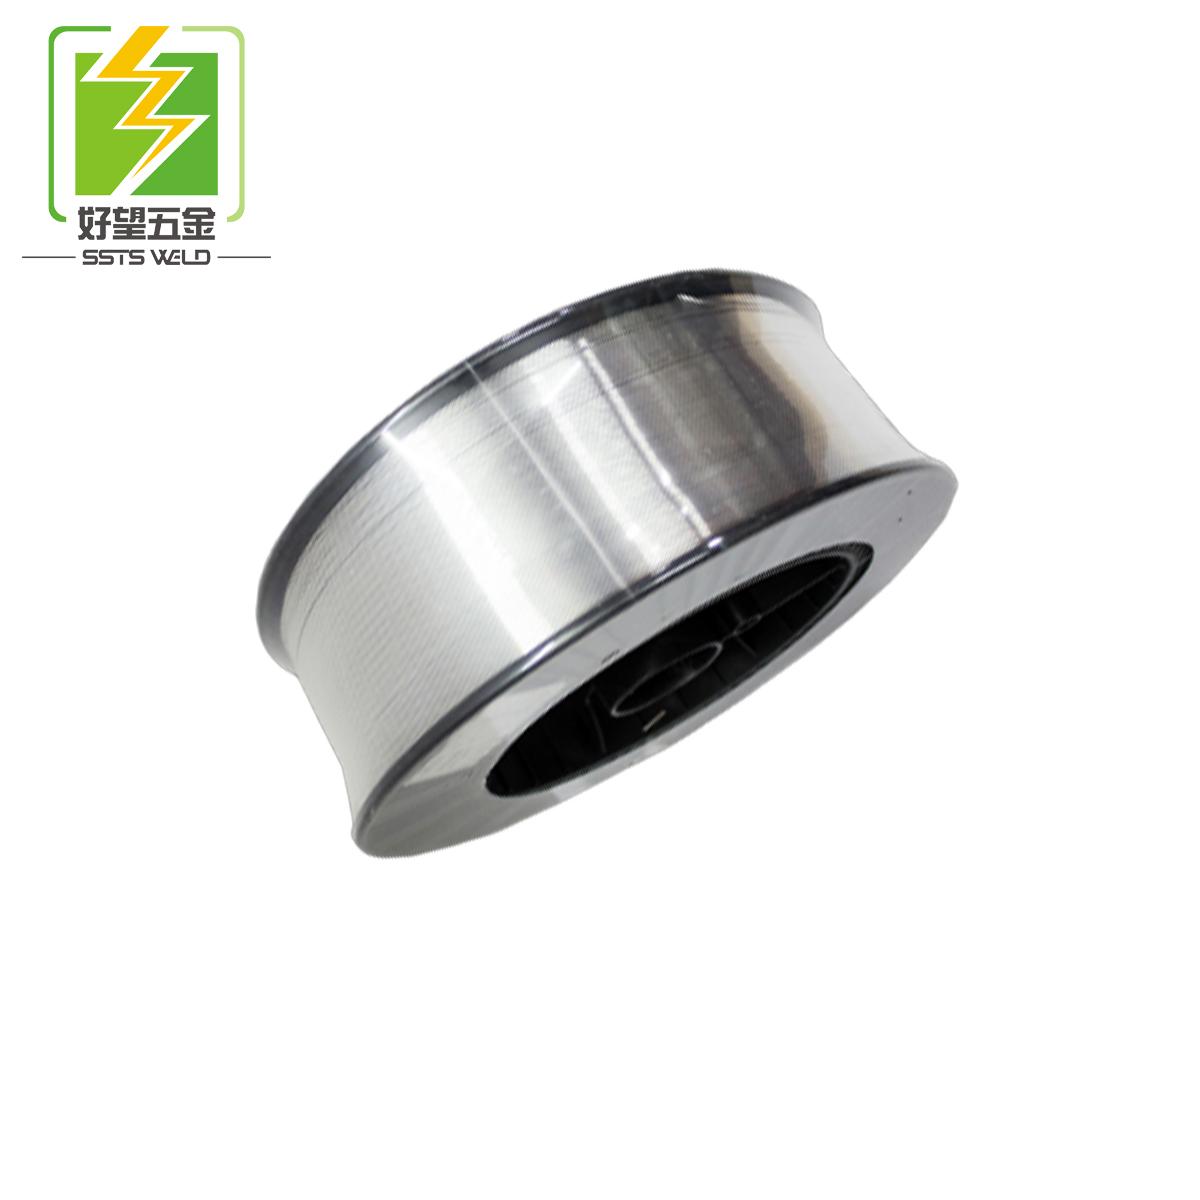 E71T-1, E71T-5 High quality flux cored welding wire